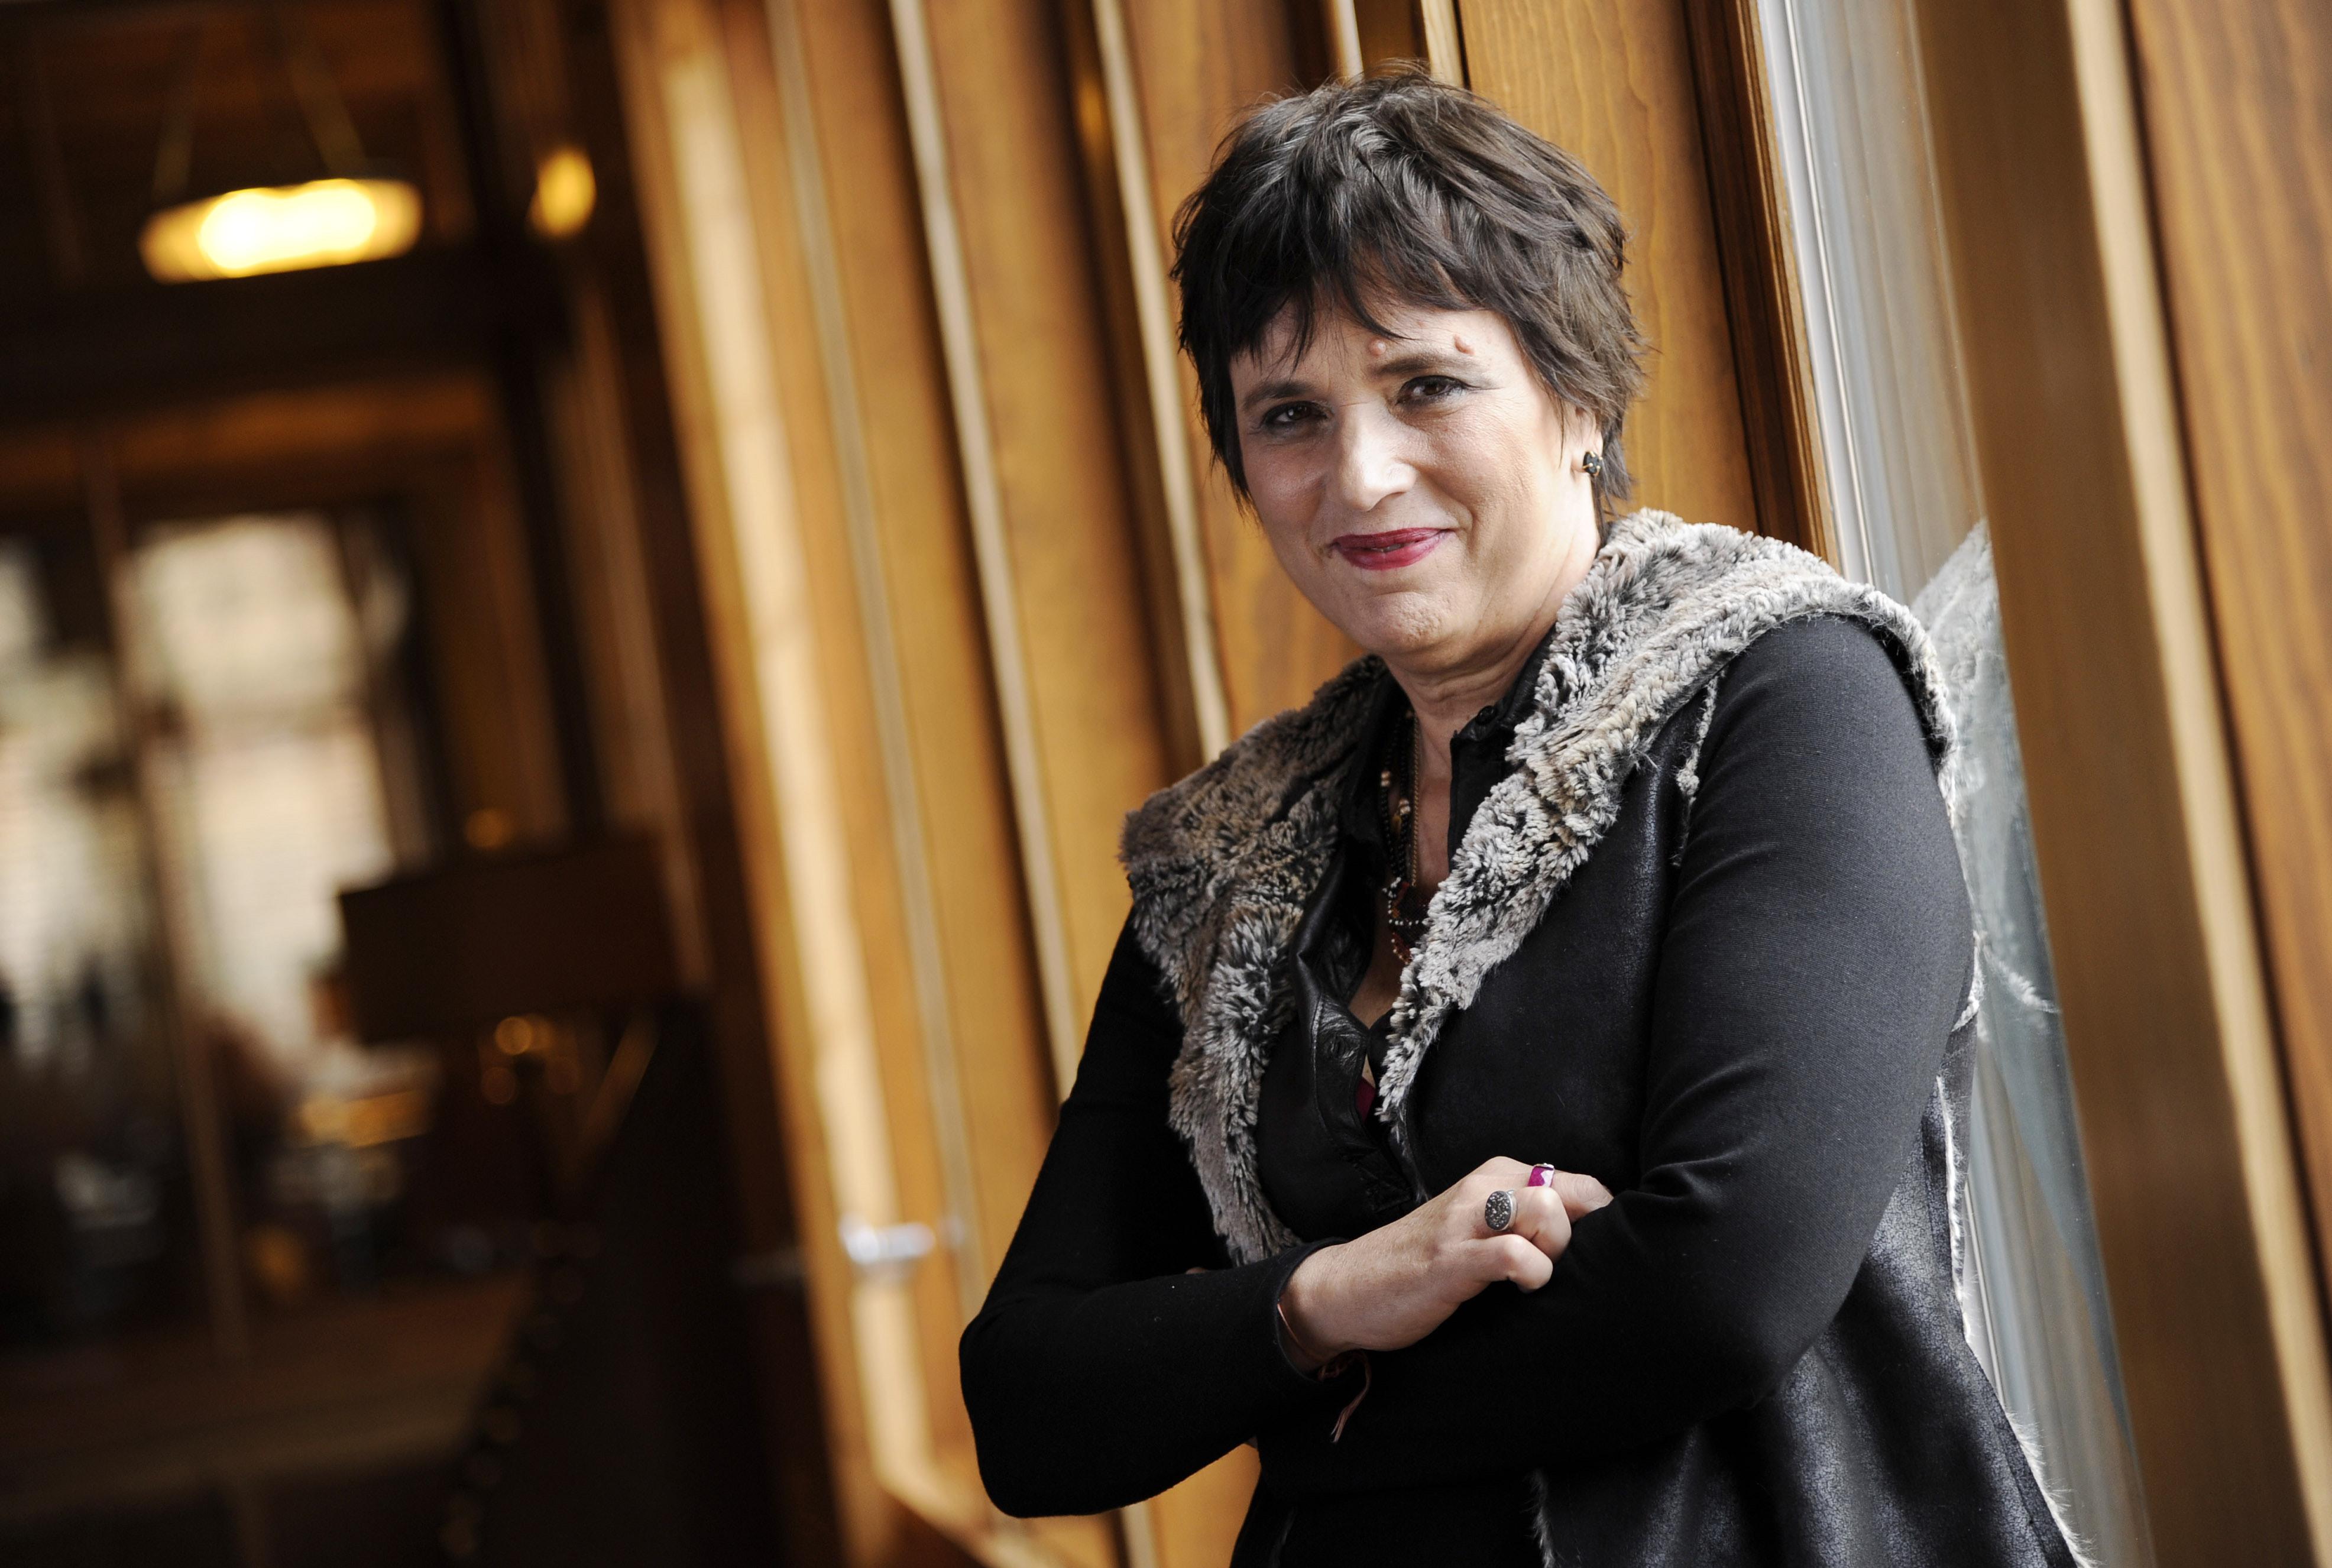 Playright Eve Ensler to get honor at John Lennon tribute